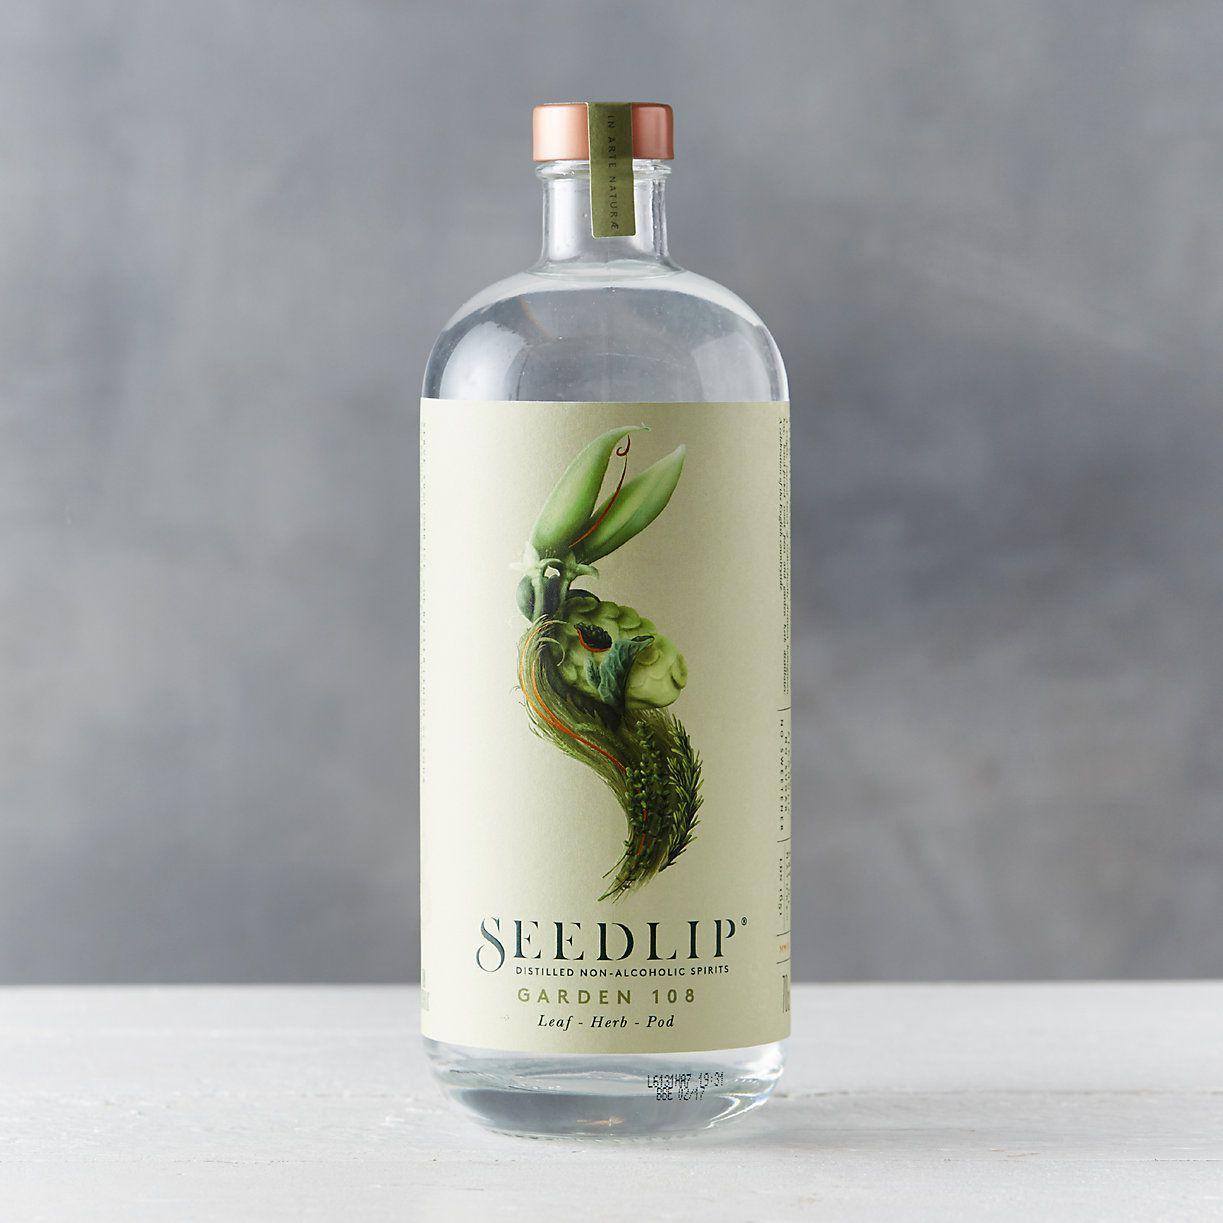 Seedlip Spice Non-Alcoholic Spirits - Terrain